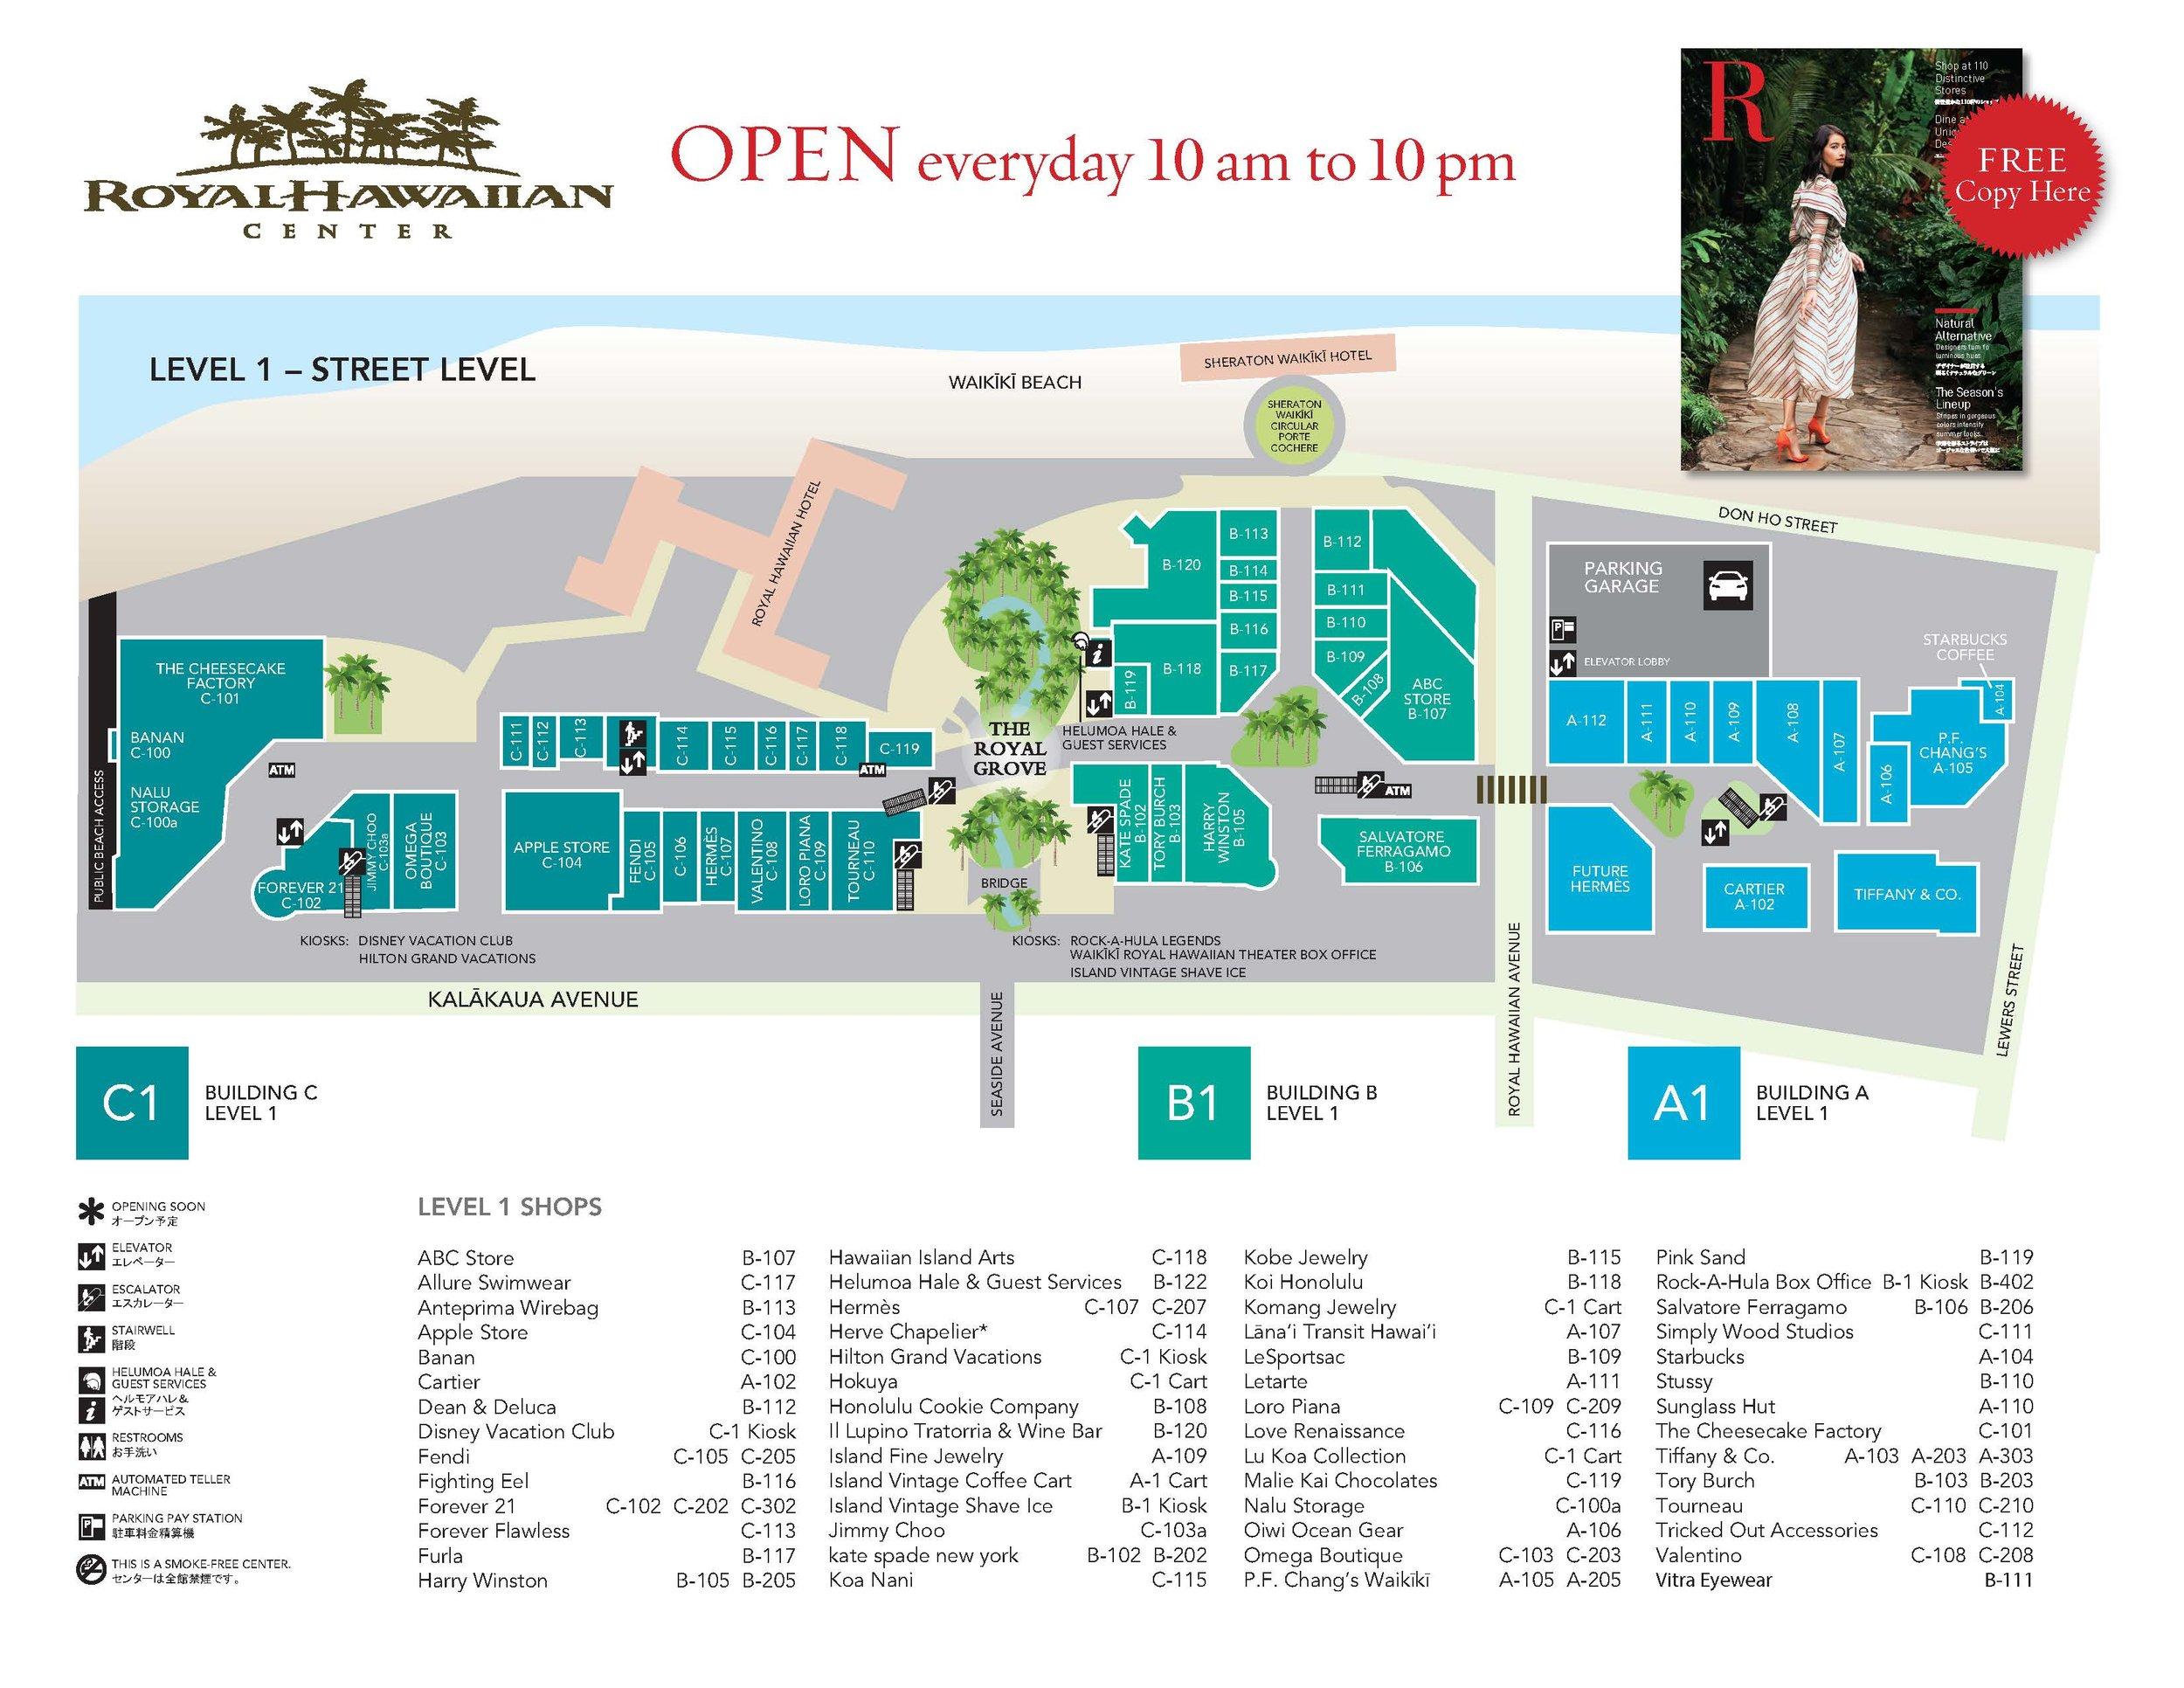 1095-16179-RH-RMag-Maps-May18-FINAL_Page_1.jpg